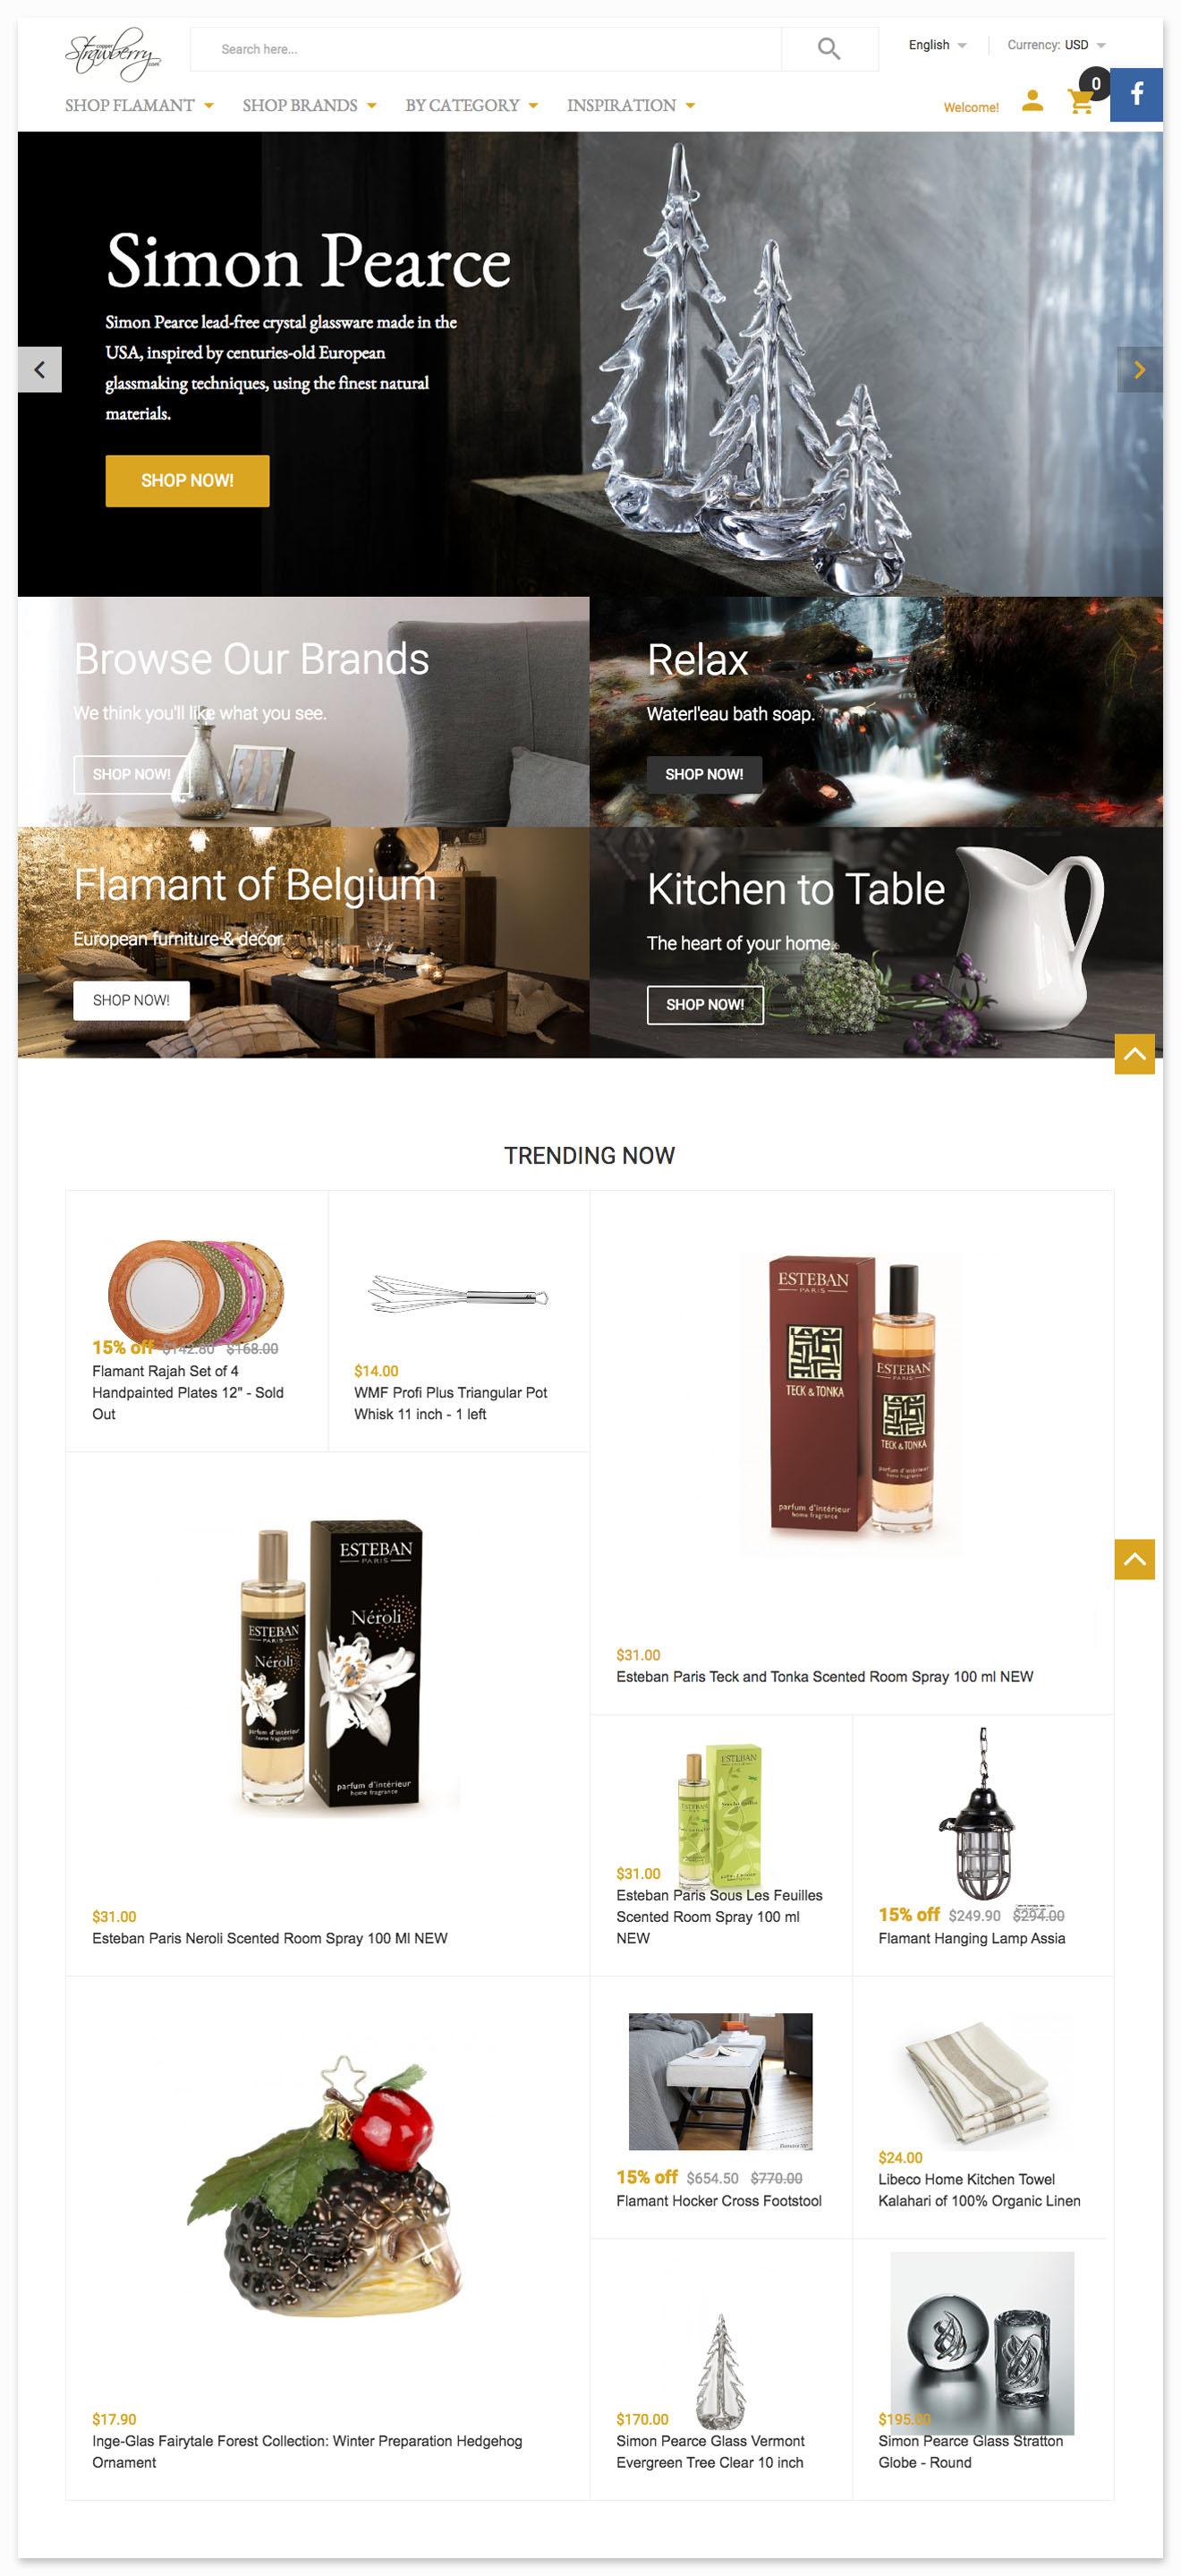 Web designers Belfast portfolio cs screenshot 1 - by veetoo design Belfast, Northern Ireland, UK.